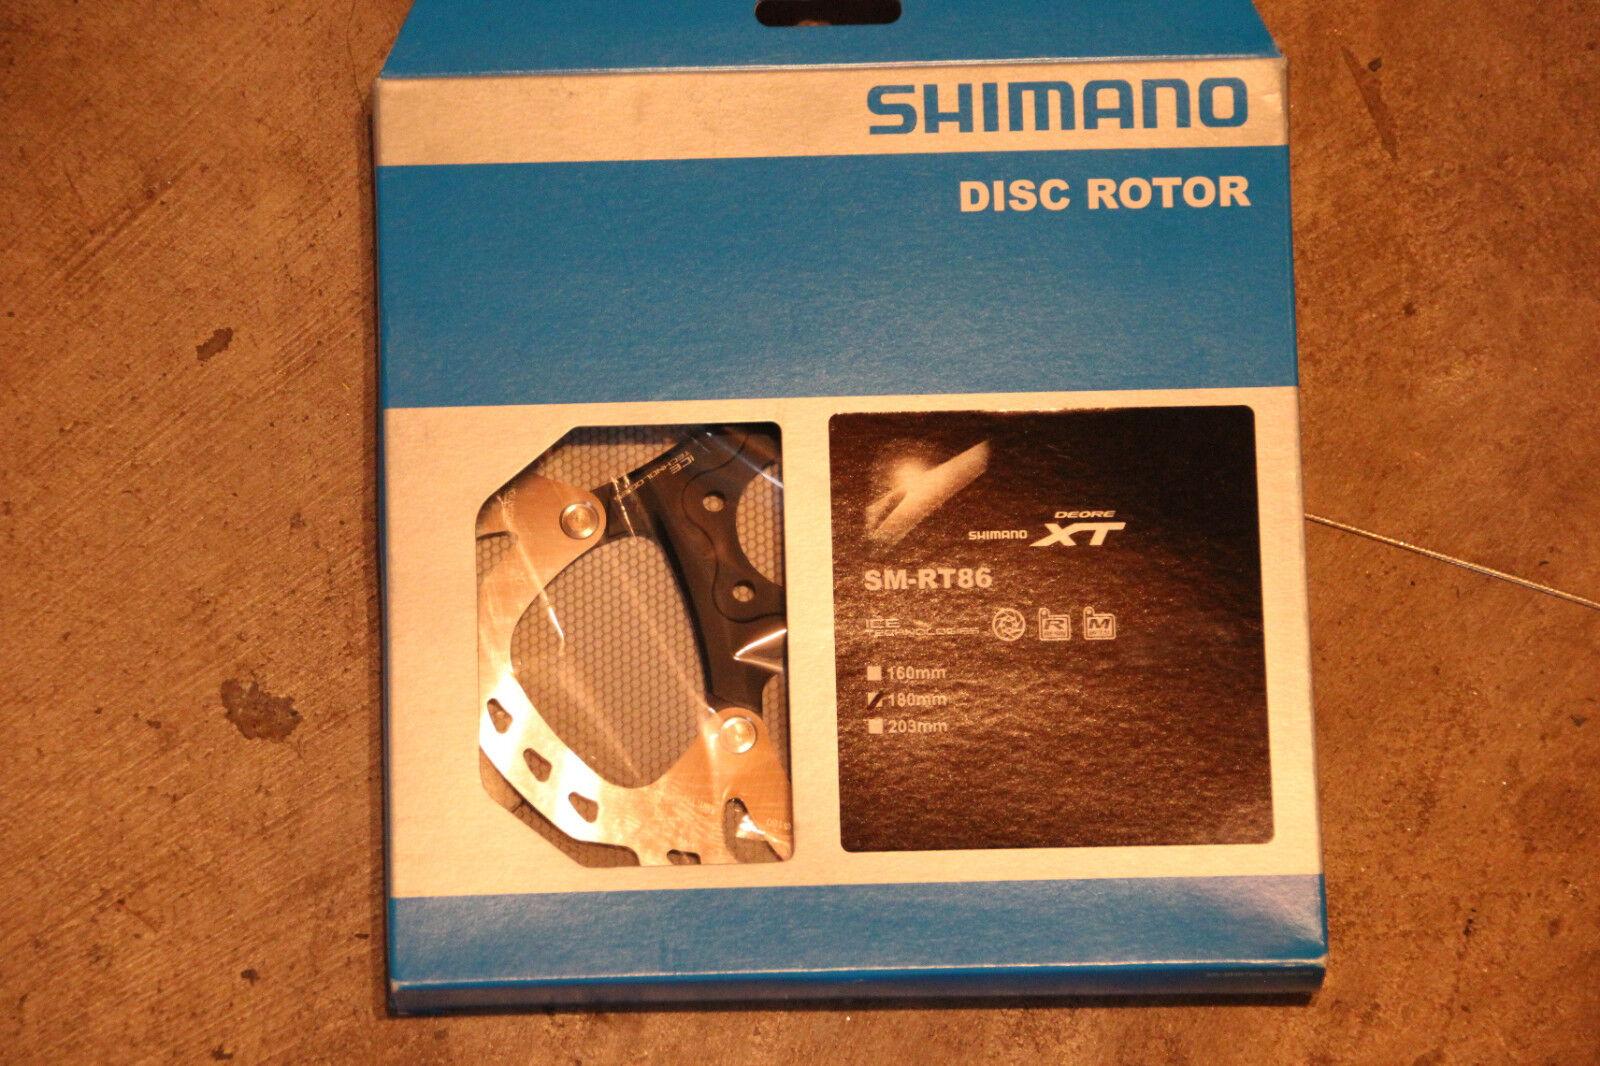 New Shimano SM-RT86 IceTech 180mm 6-bolt brake redor